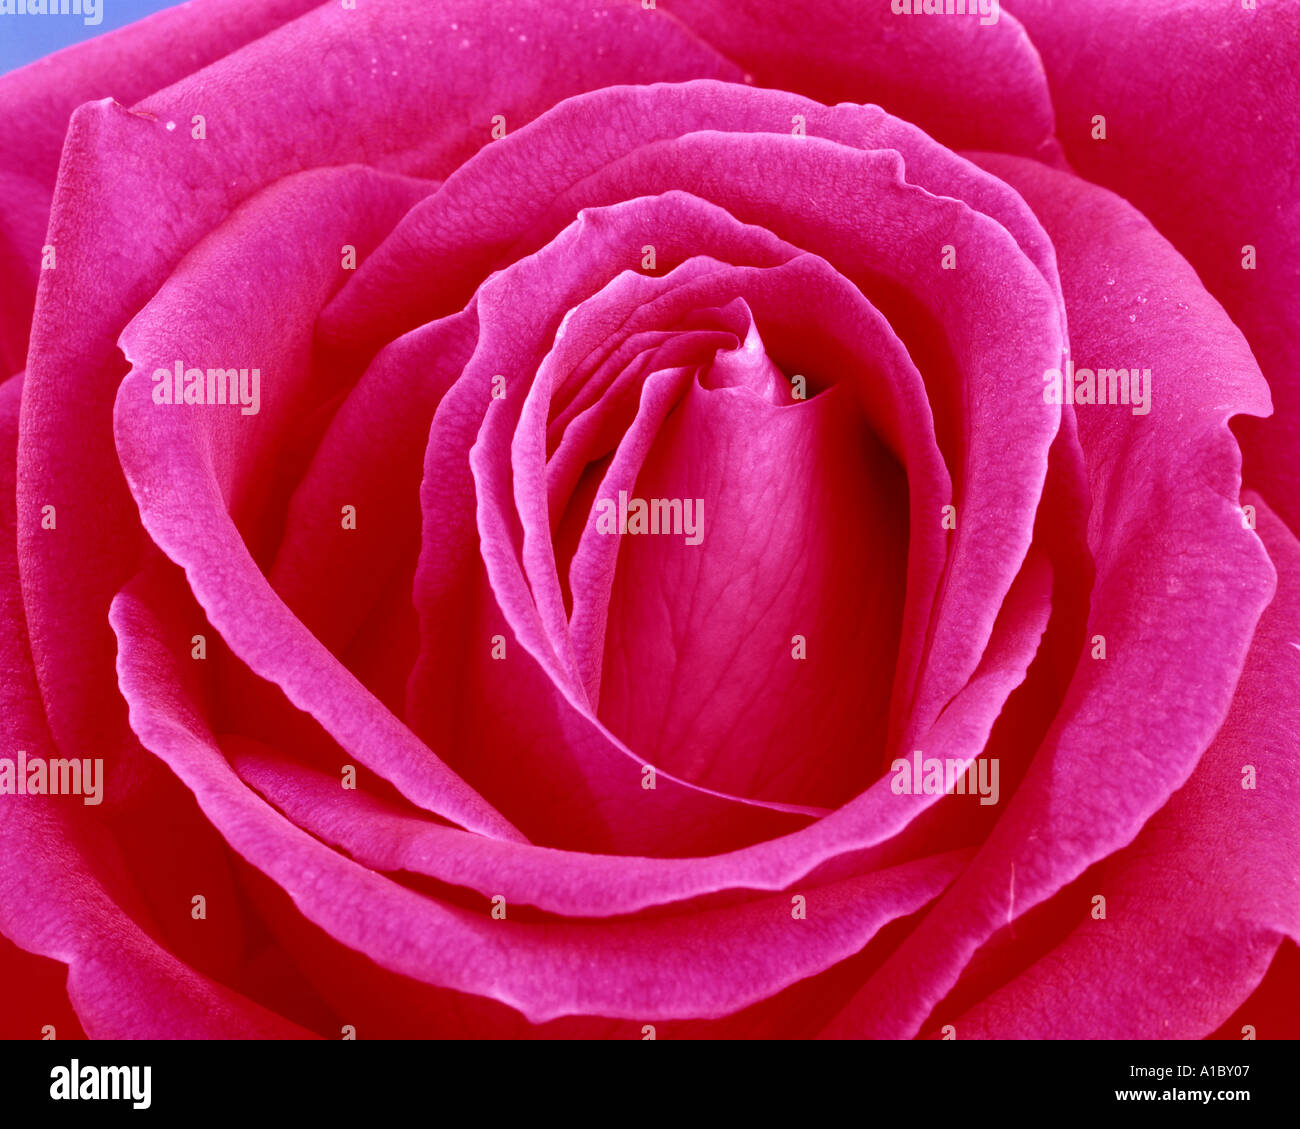 FLORA: Englisch Red Rose (lat.: rosa Händel) Stockfoto